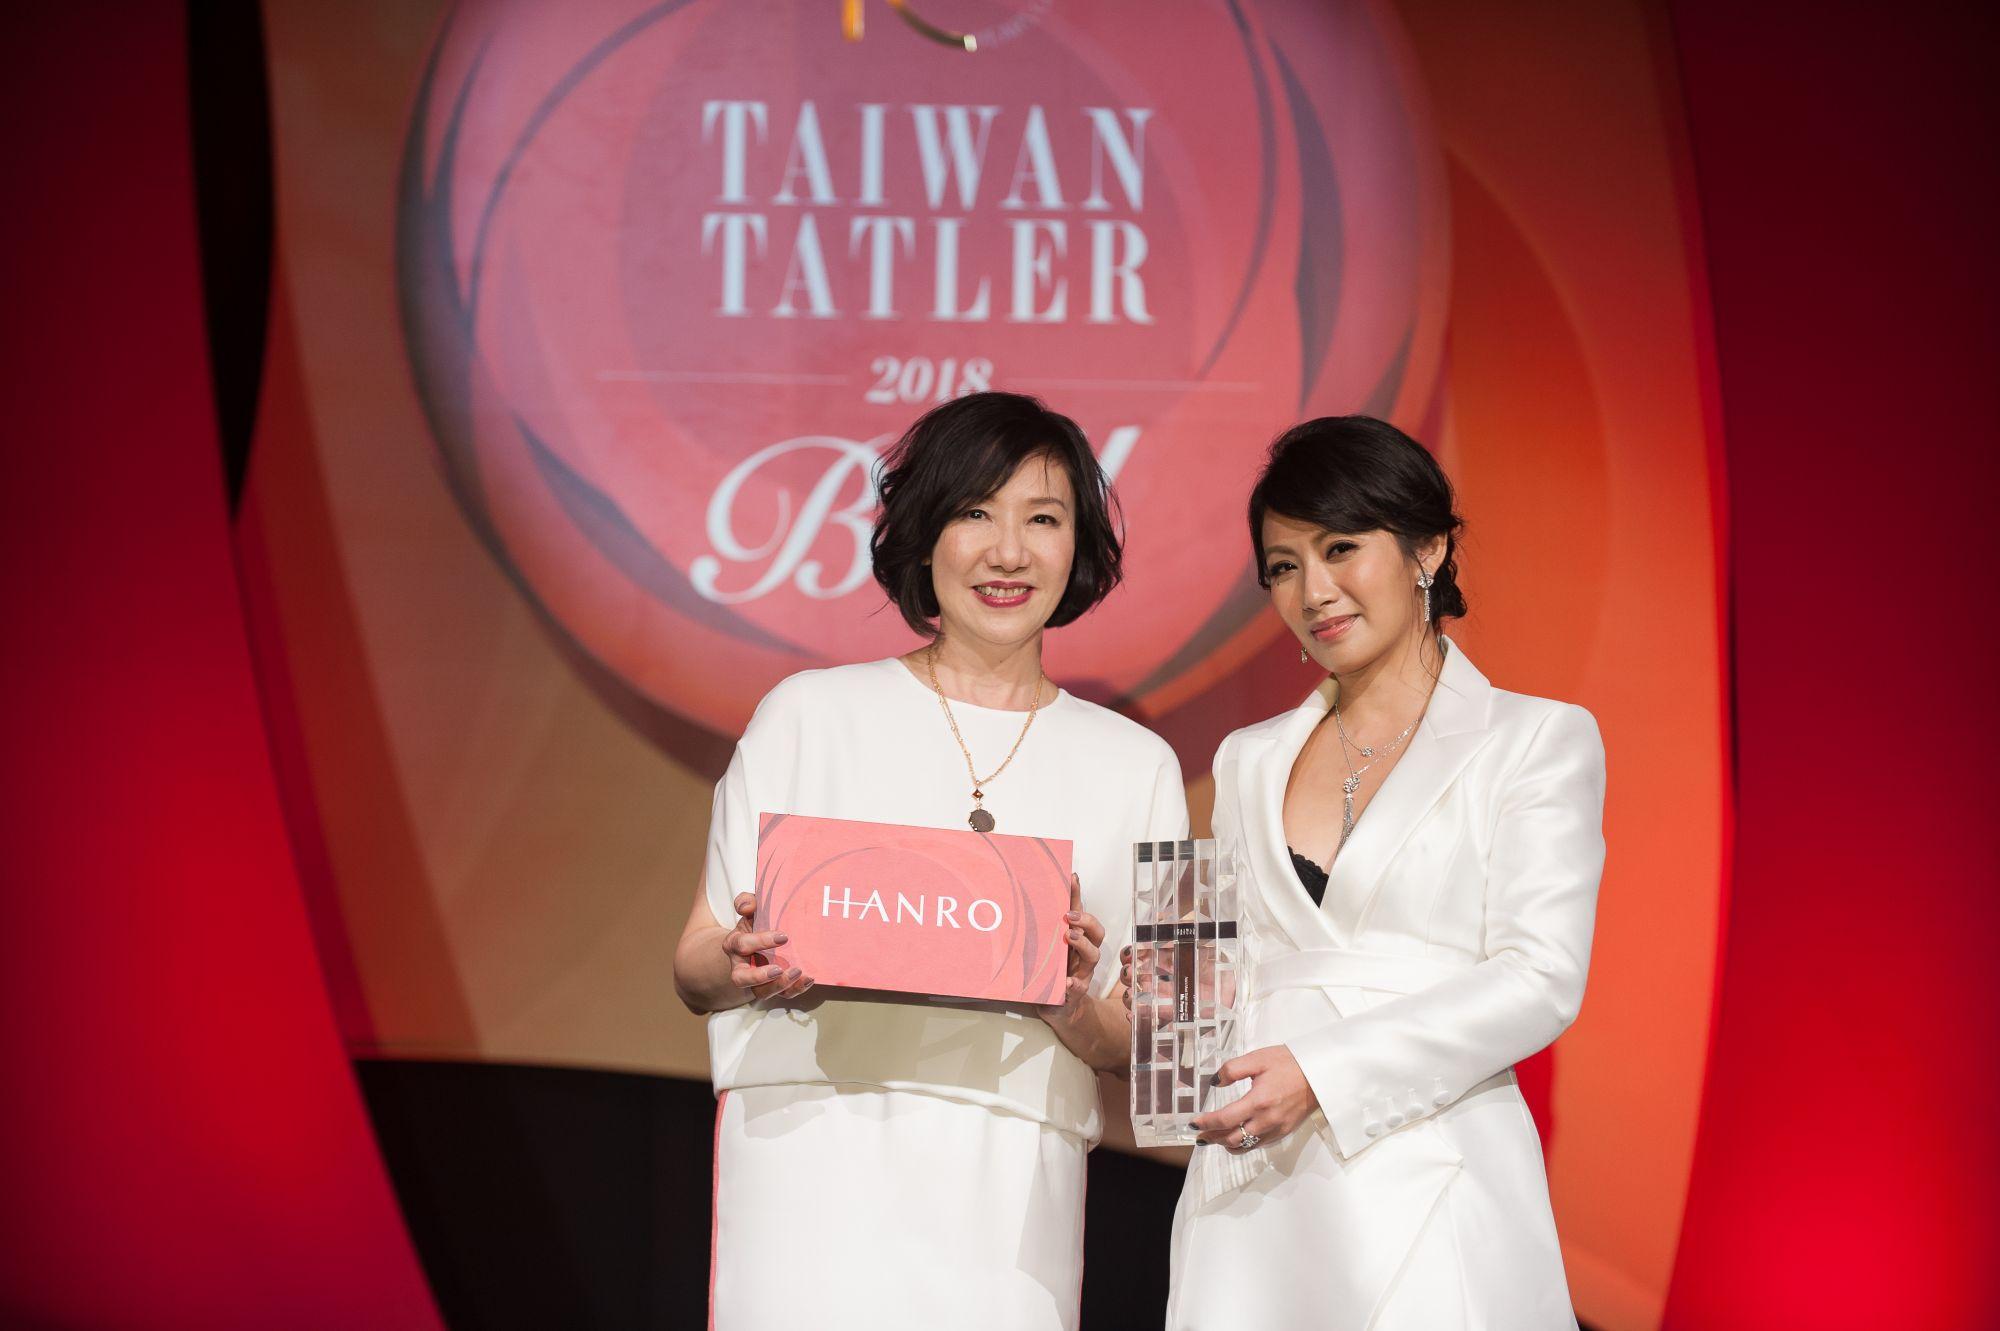 Weng Collection執行長蔡佳宸獲「亞洲最具風尚女性」,獎品由Hanro贊助。